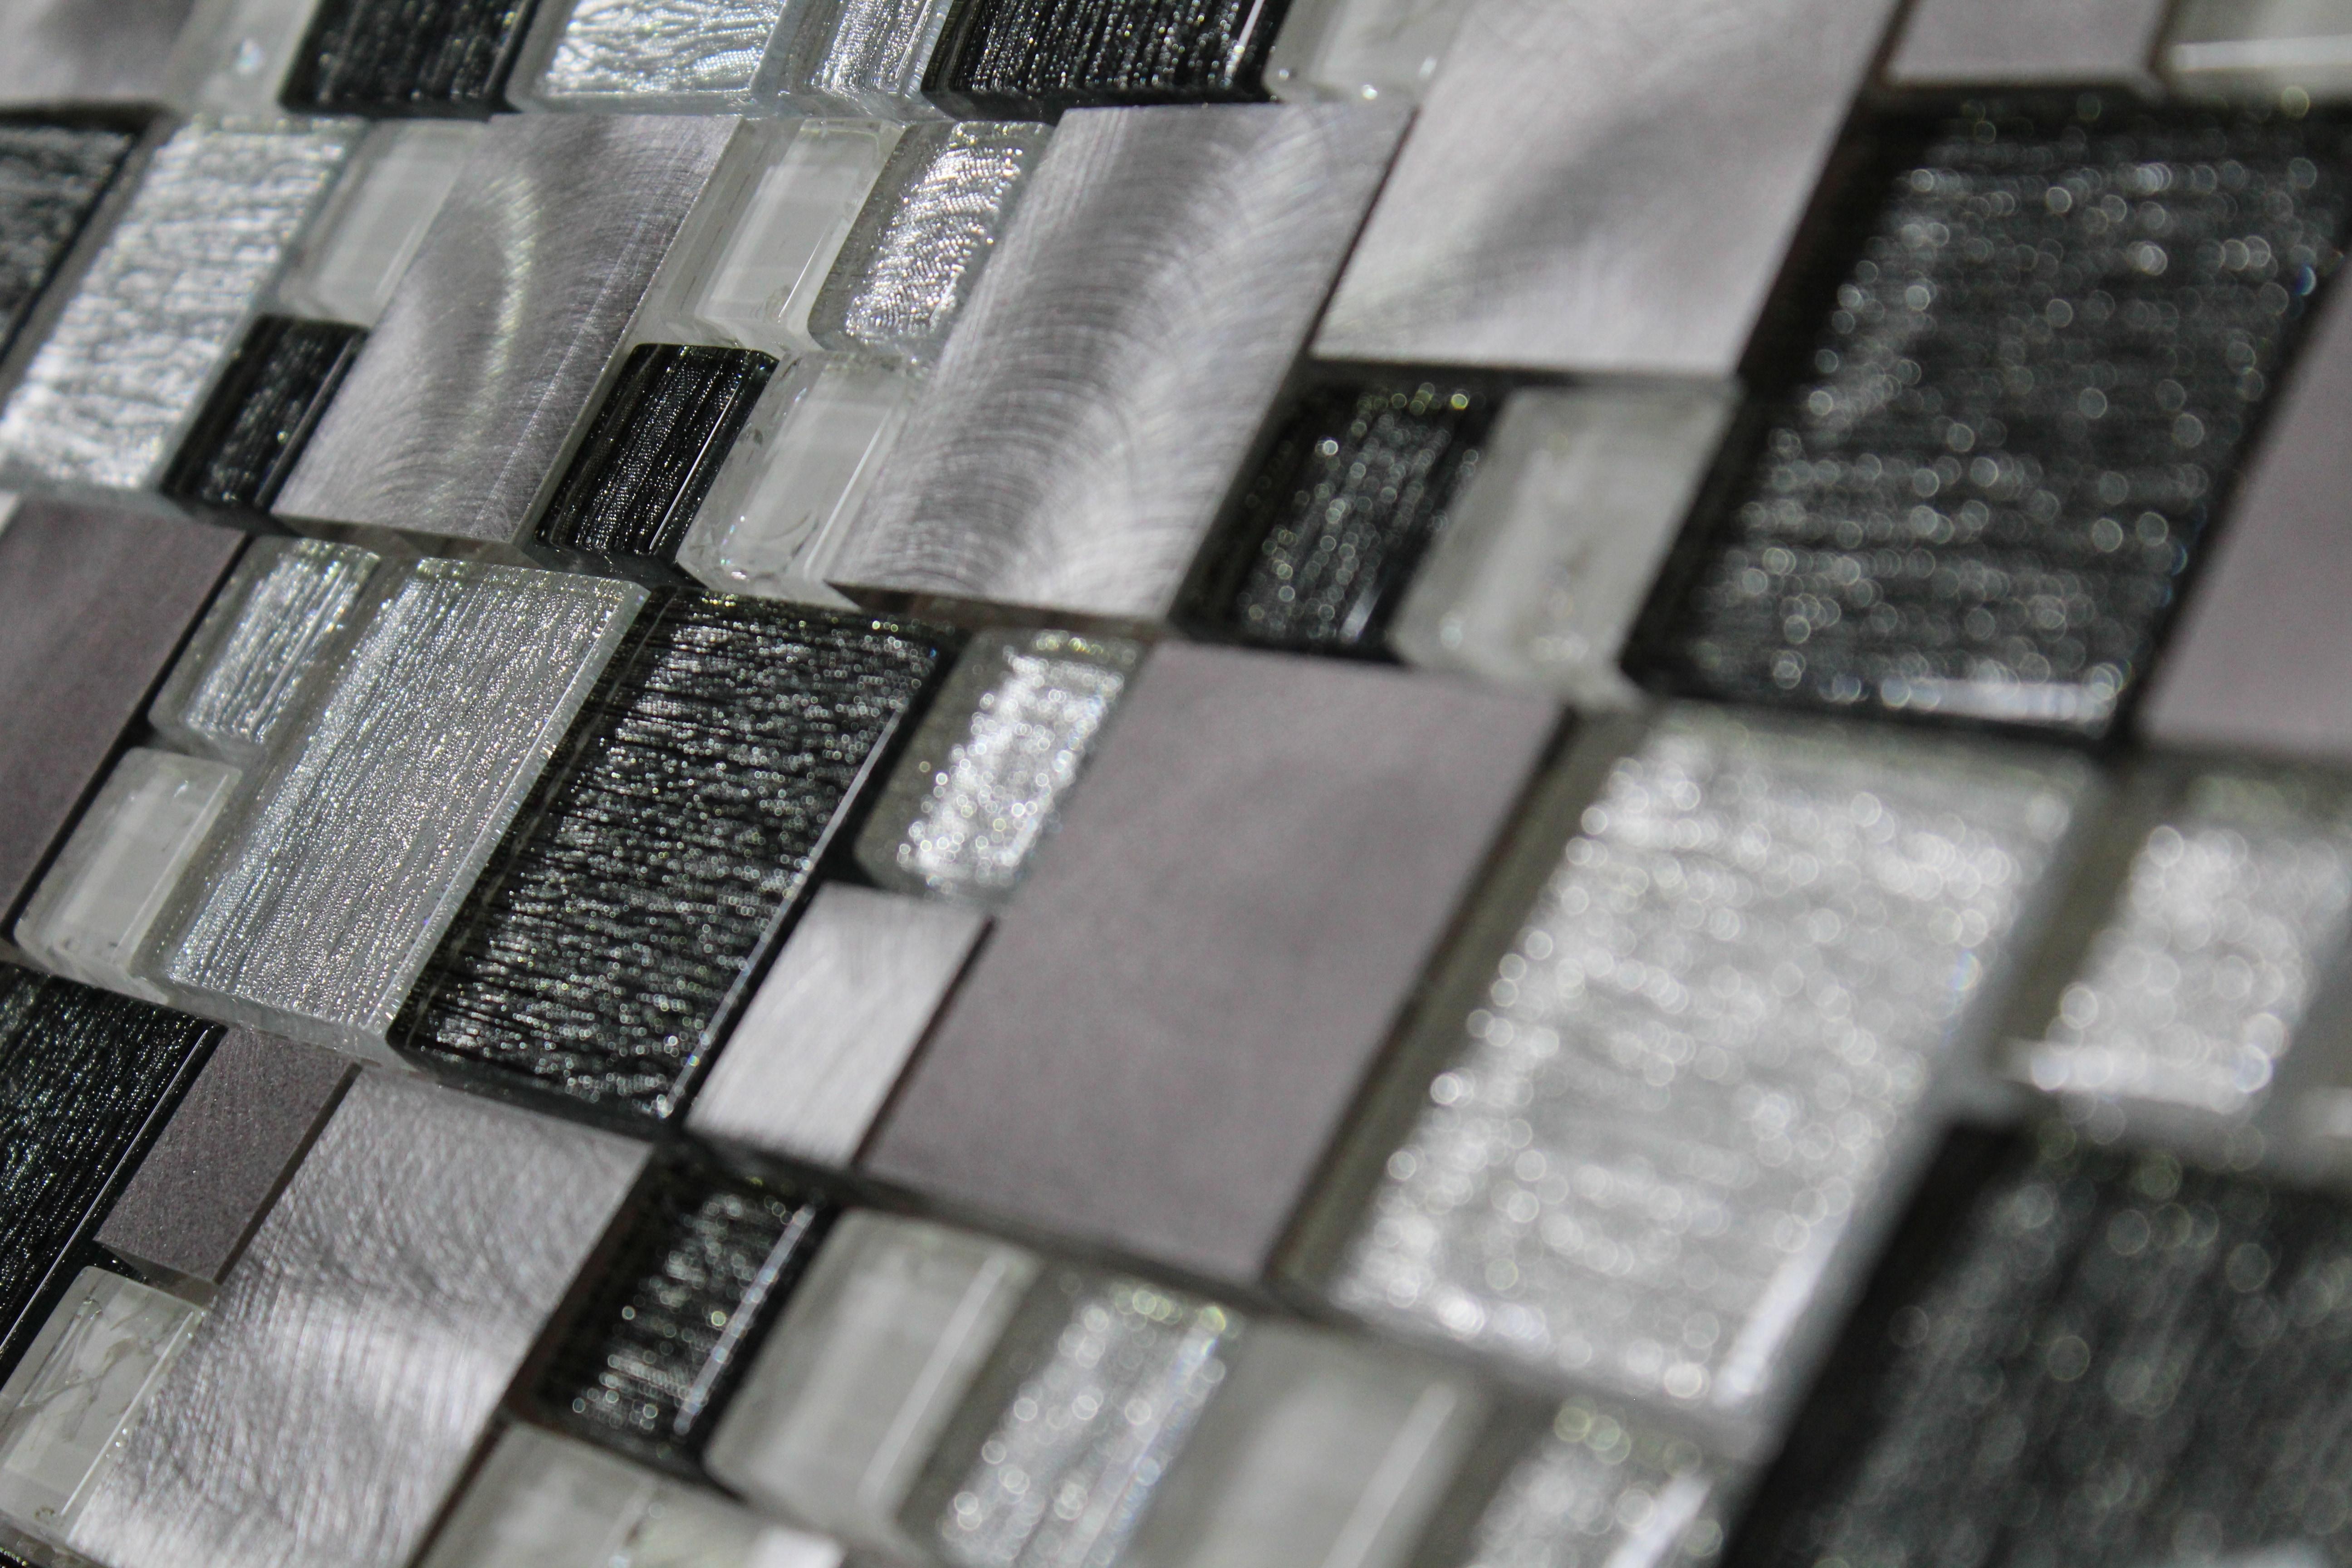 Glass Mosaic / 12 x 12 x 0.31 inches / Glossy Random Sized Square Glass & Aluminum Mosaic Tile White, Gray & Black 0